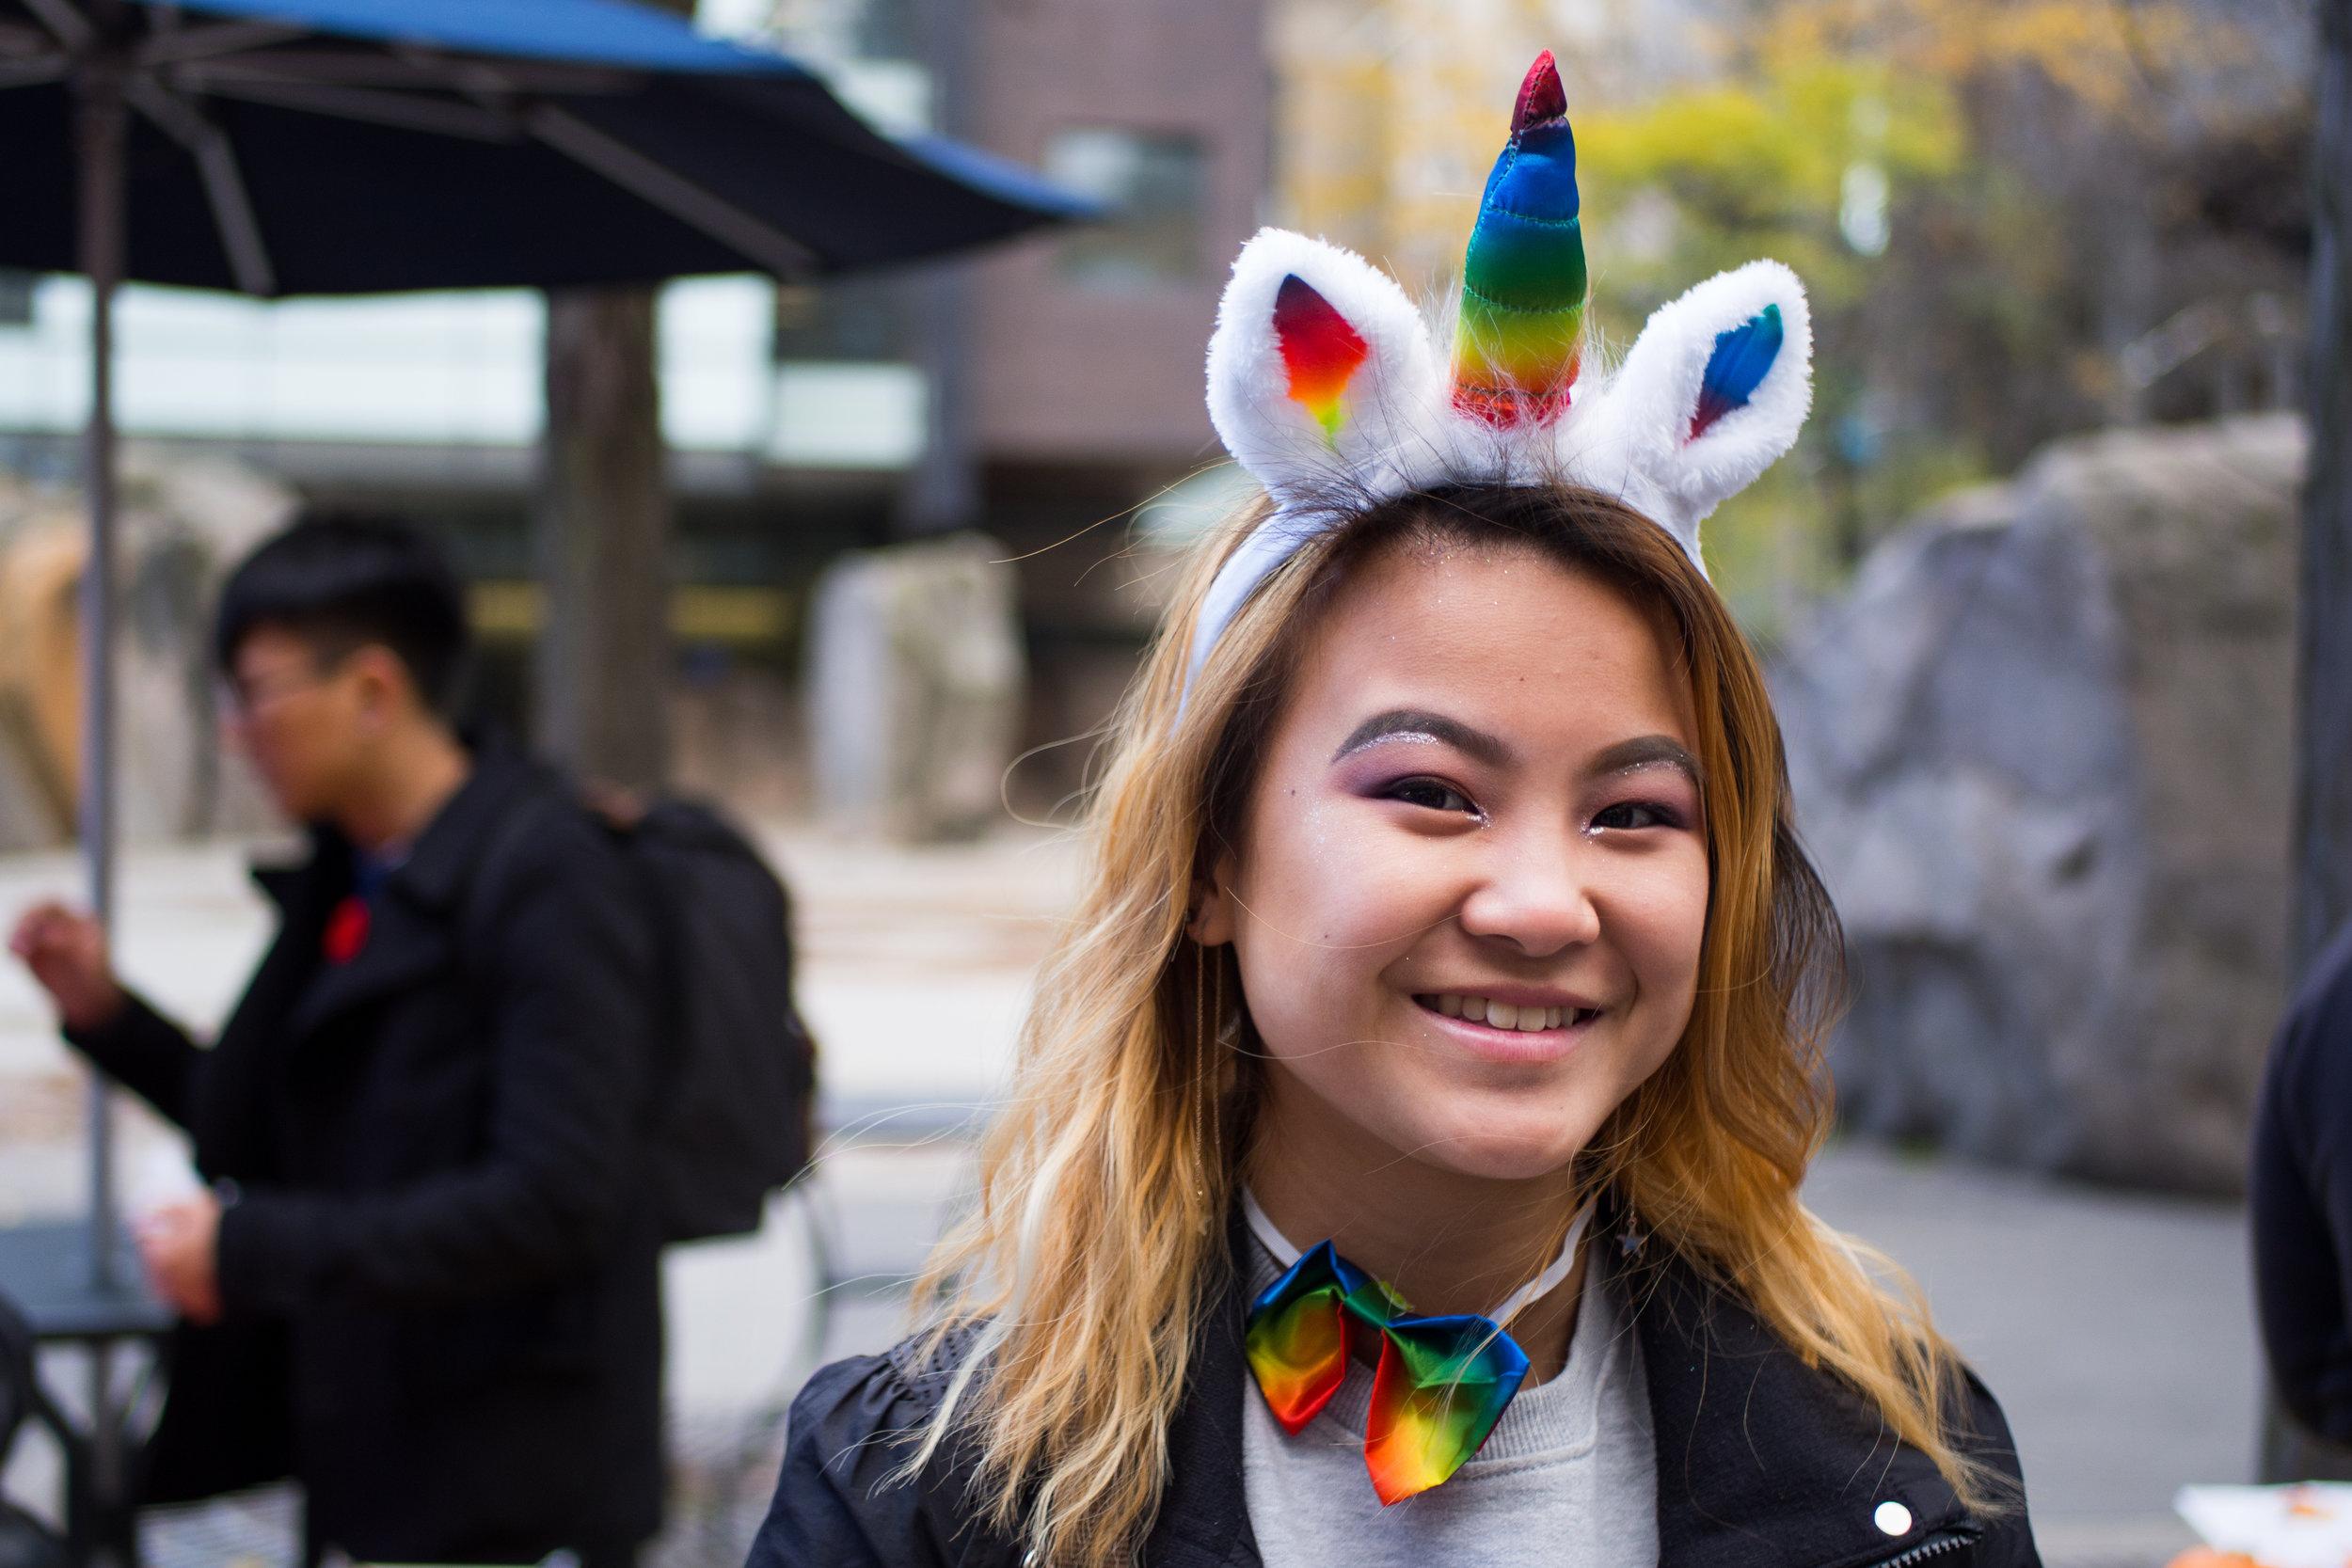 Karmen Man, 18, walks around the fall festival in her unicorn costume. (J. Cameron/CanCulture)